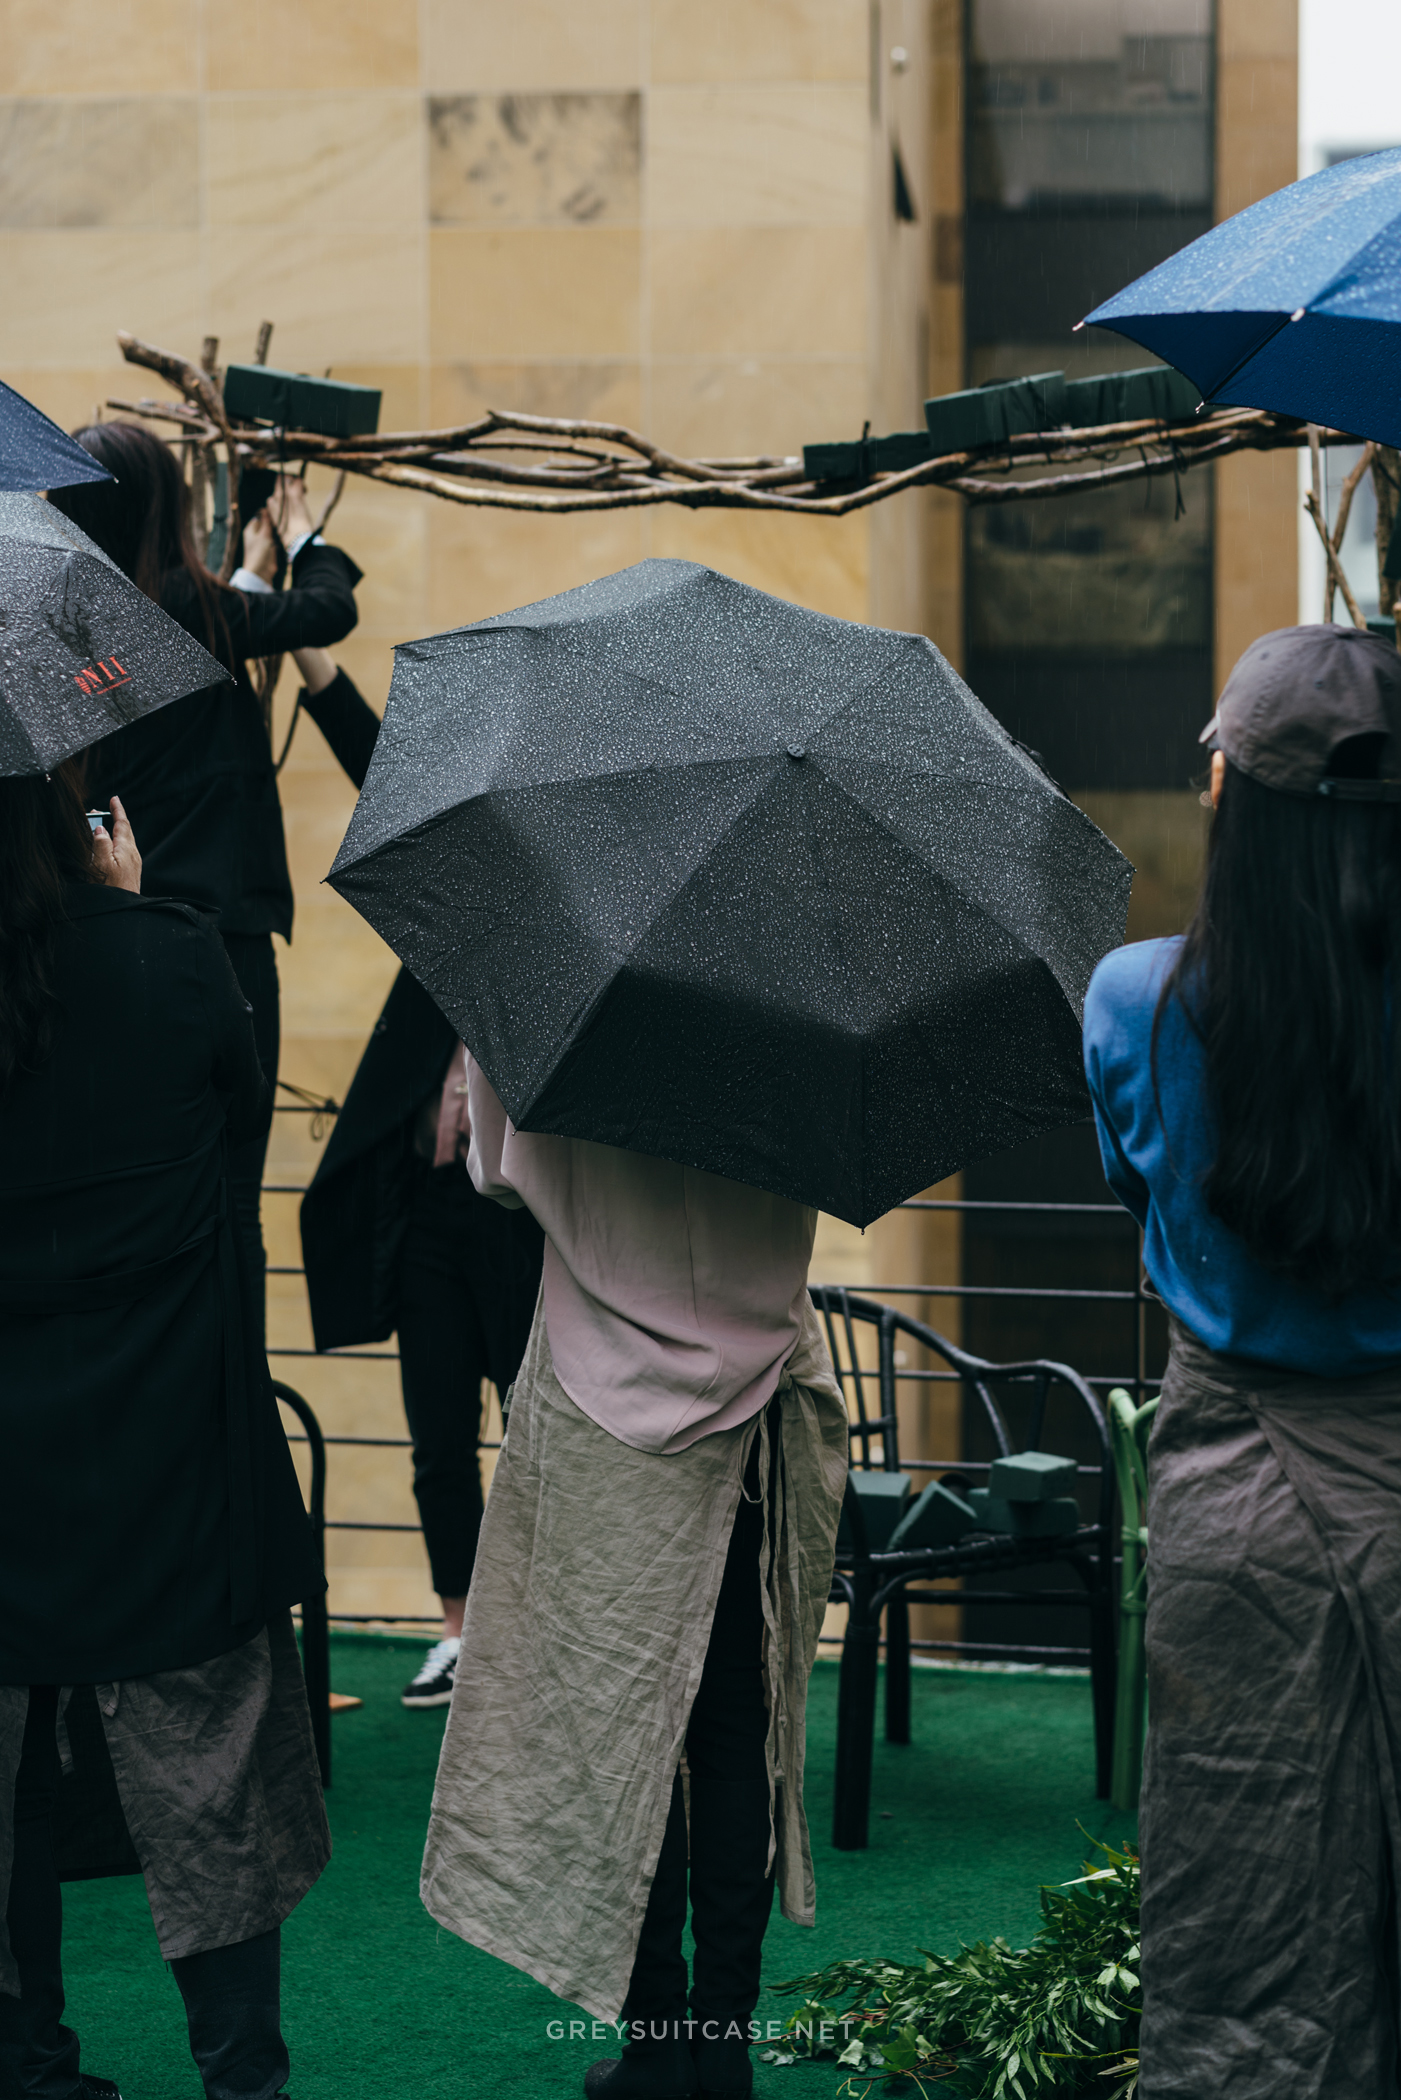 Greysuitcase Travel Series - Seoul Spring '17 - Workshop, Seoul, South Korea